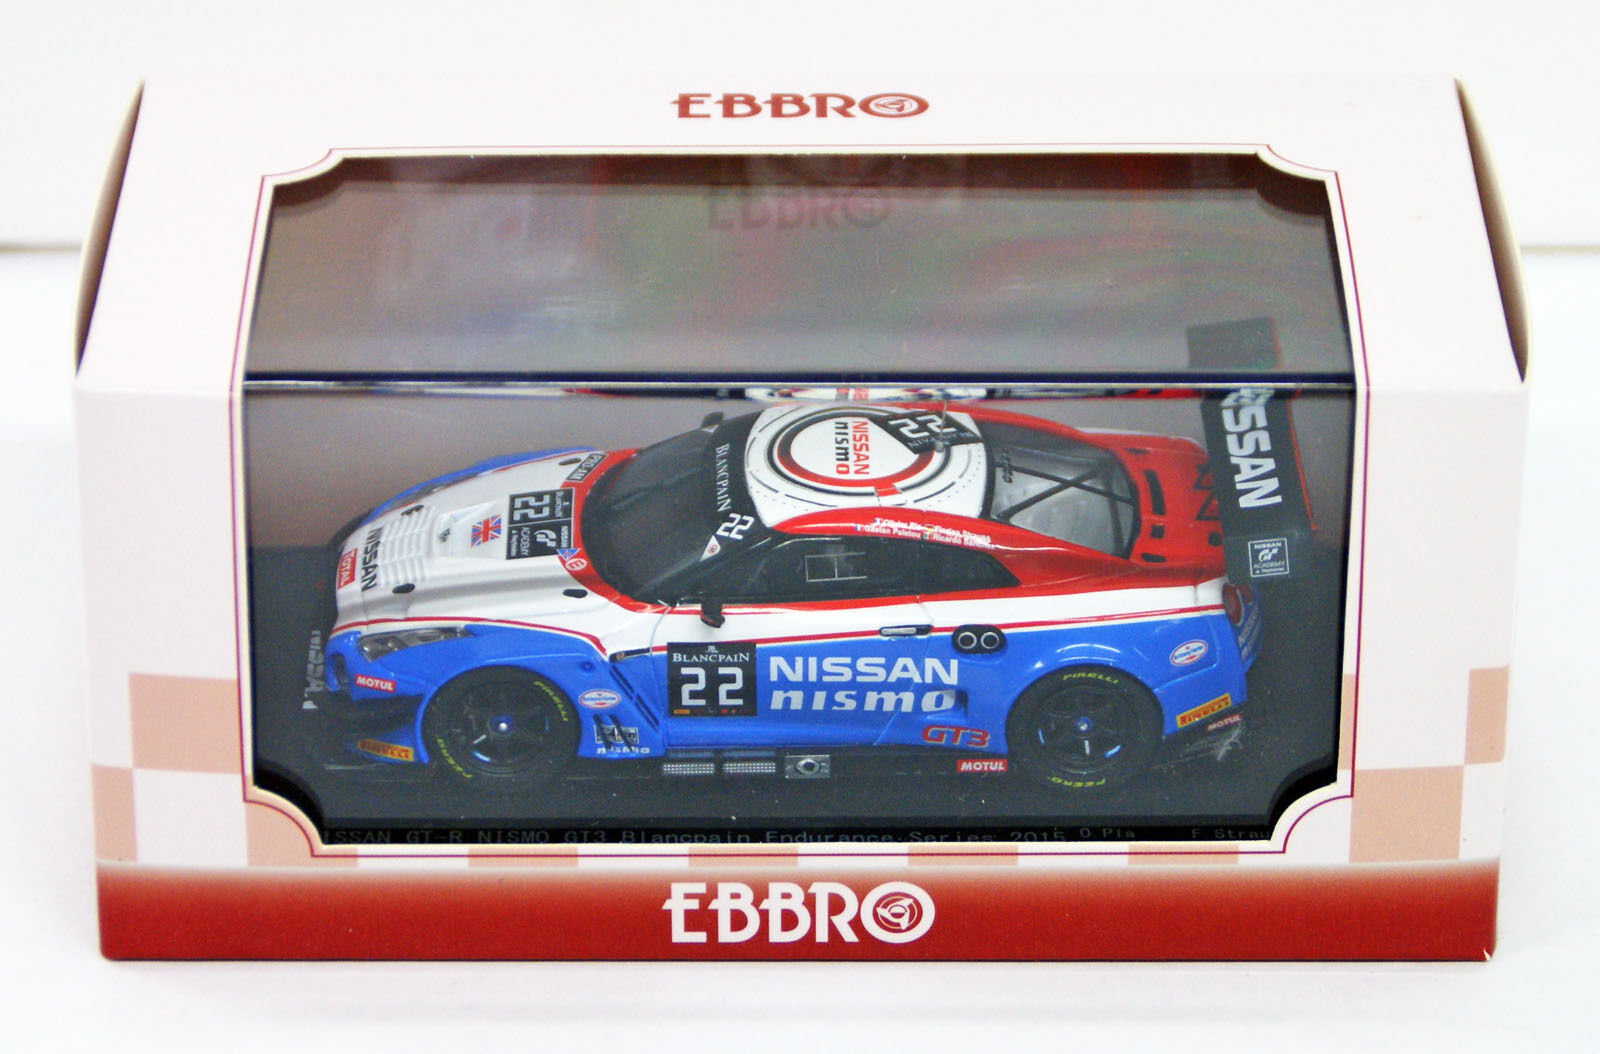 Ebbro 45482 Nissan GT-R Nismo GT3 blancoopain Endurance escala 2015 No.22 1 43